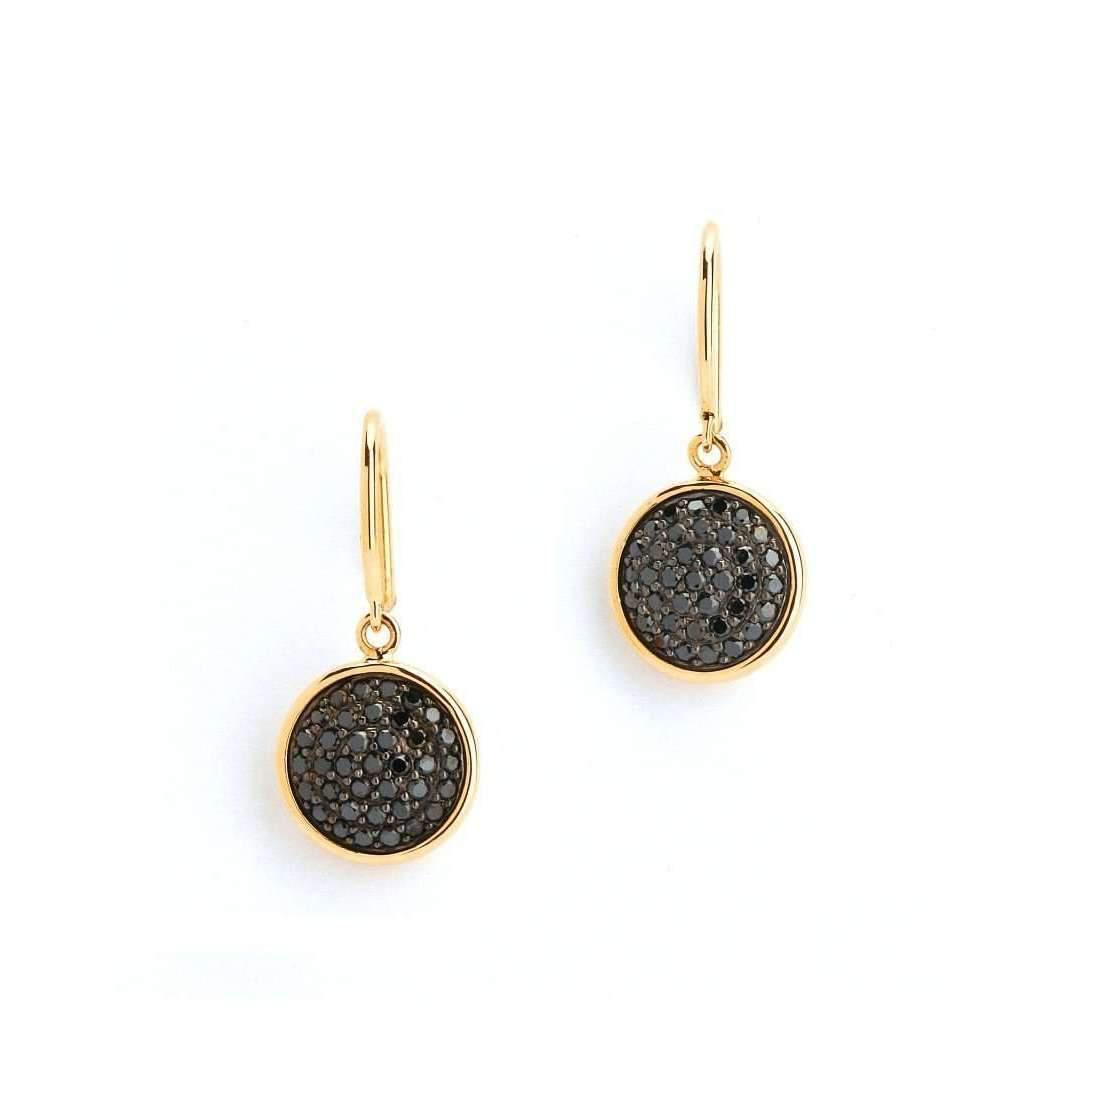 Syna 18kt Quad Blue Sapphire & Champagne Diamond Earrings QGGd42